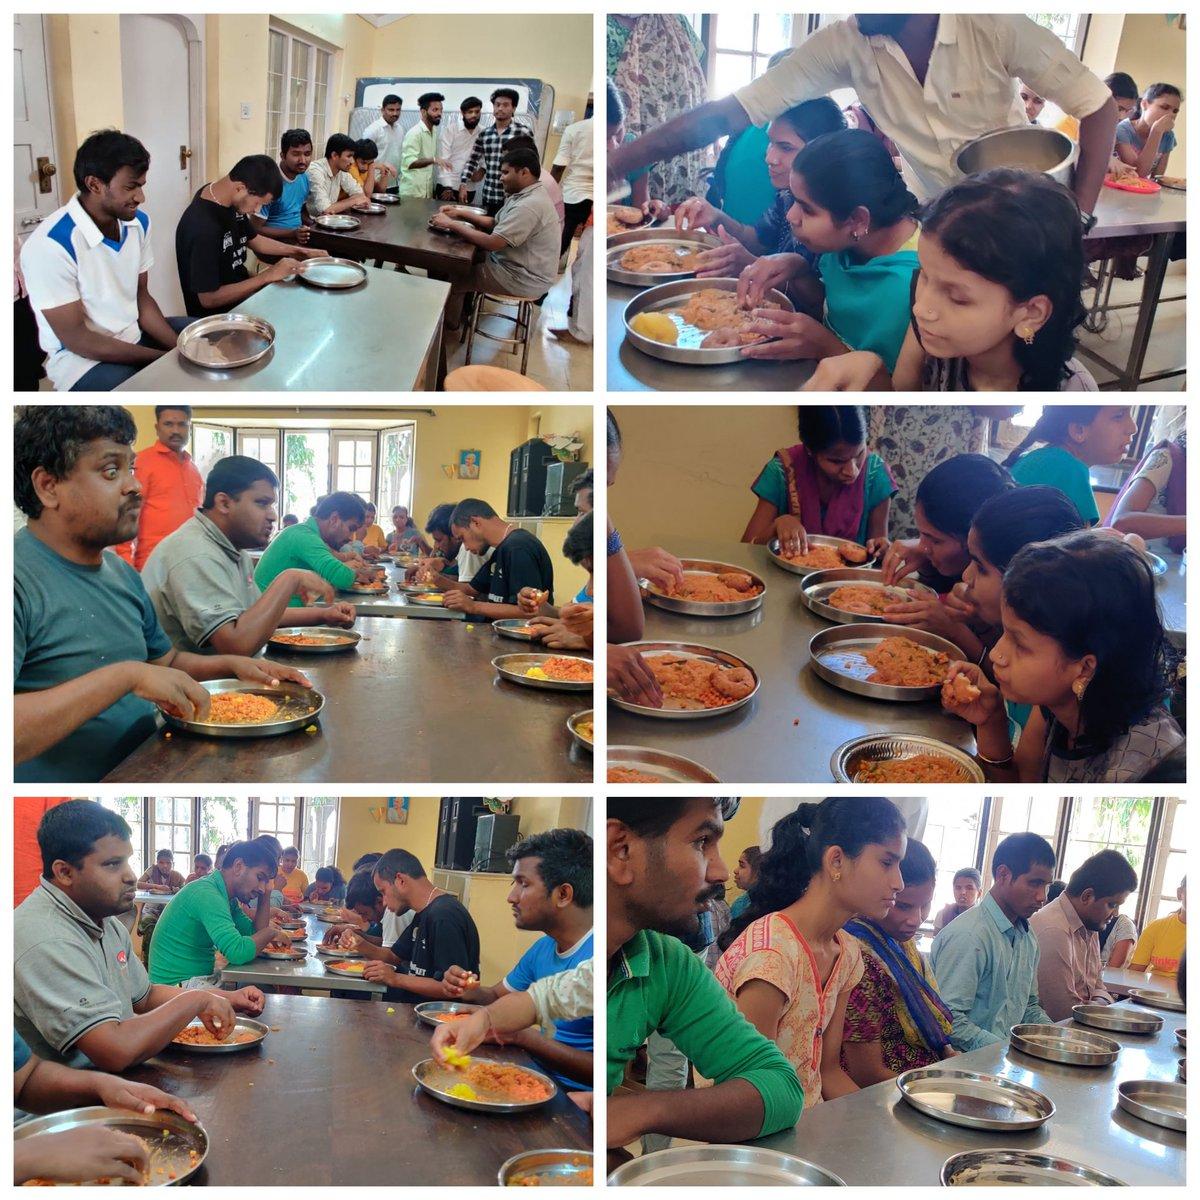 On Occasion Of #BTP Dr.Vijay Makkal Iyakkam 1st Year Anniversary Of Our Bangalore Tamil Pasanga Dr.Vijay Makkal Iyyakkam ® 38972 Has Provided Foods & Sweets In Blind Ashram.. ❤  @actorvijay | @Jagadishbliss | @BussyAnand   #Master #BTPVMI1stYearAnniversary #KuttiStory